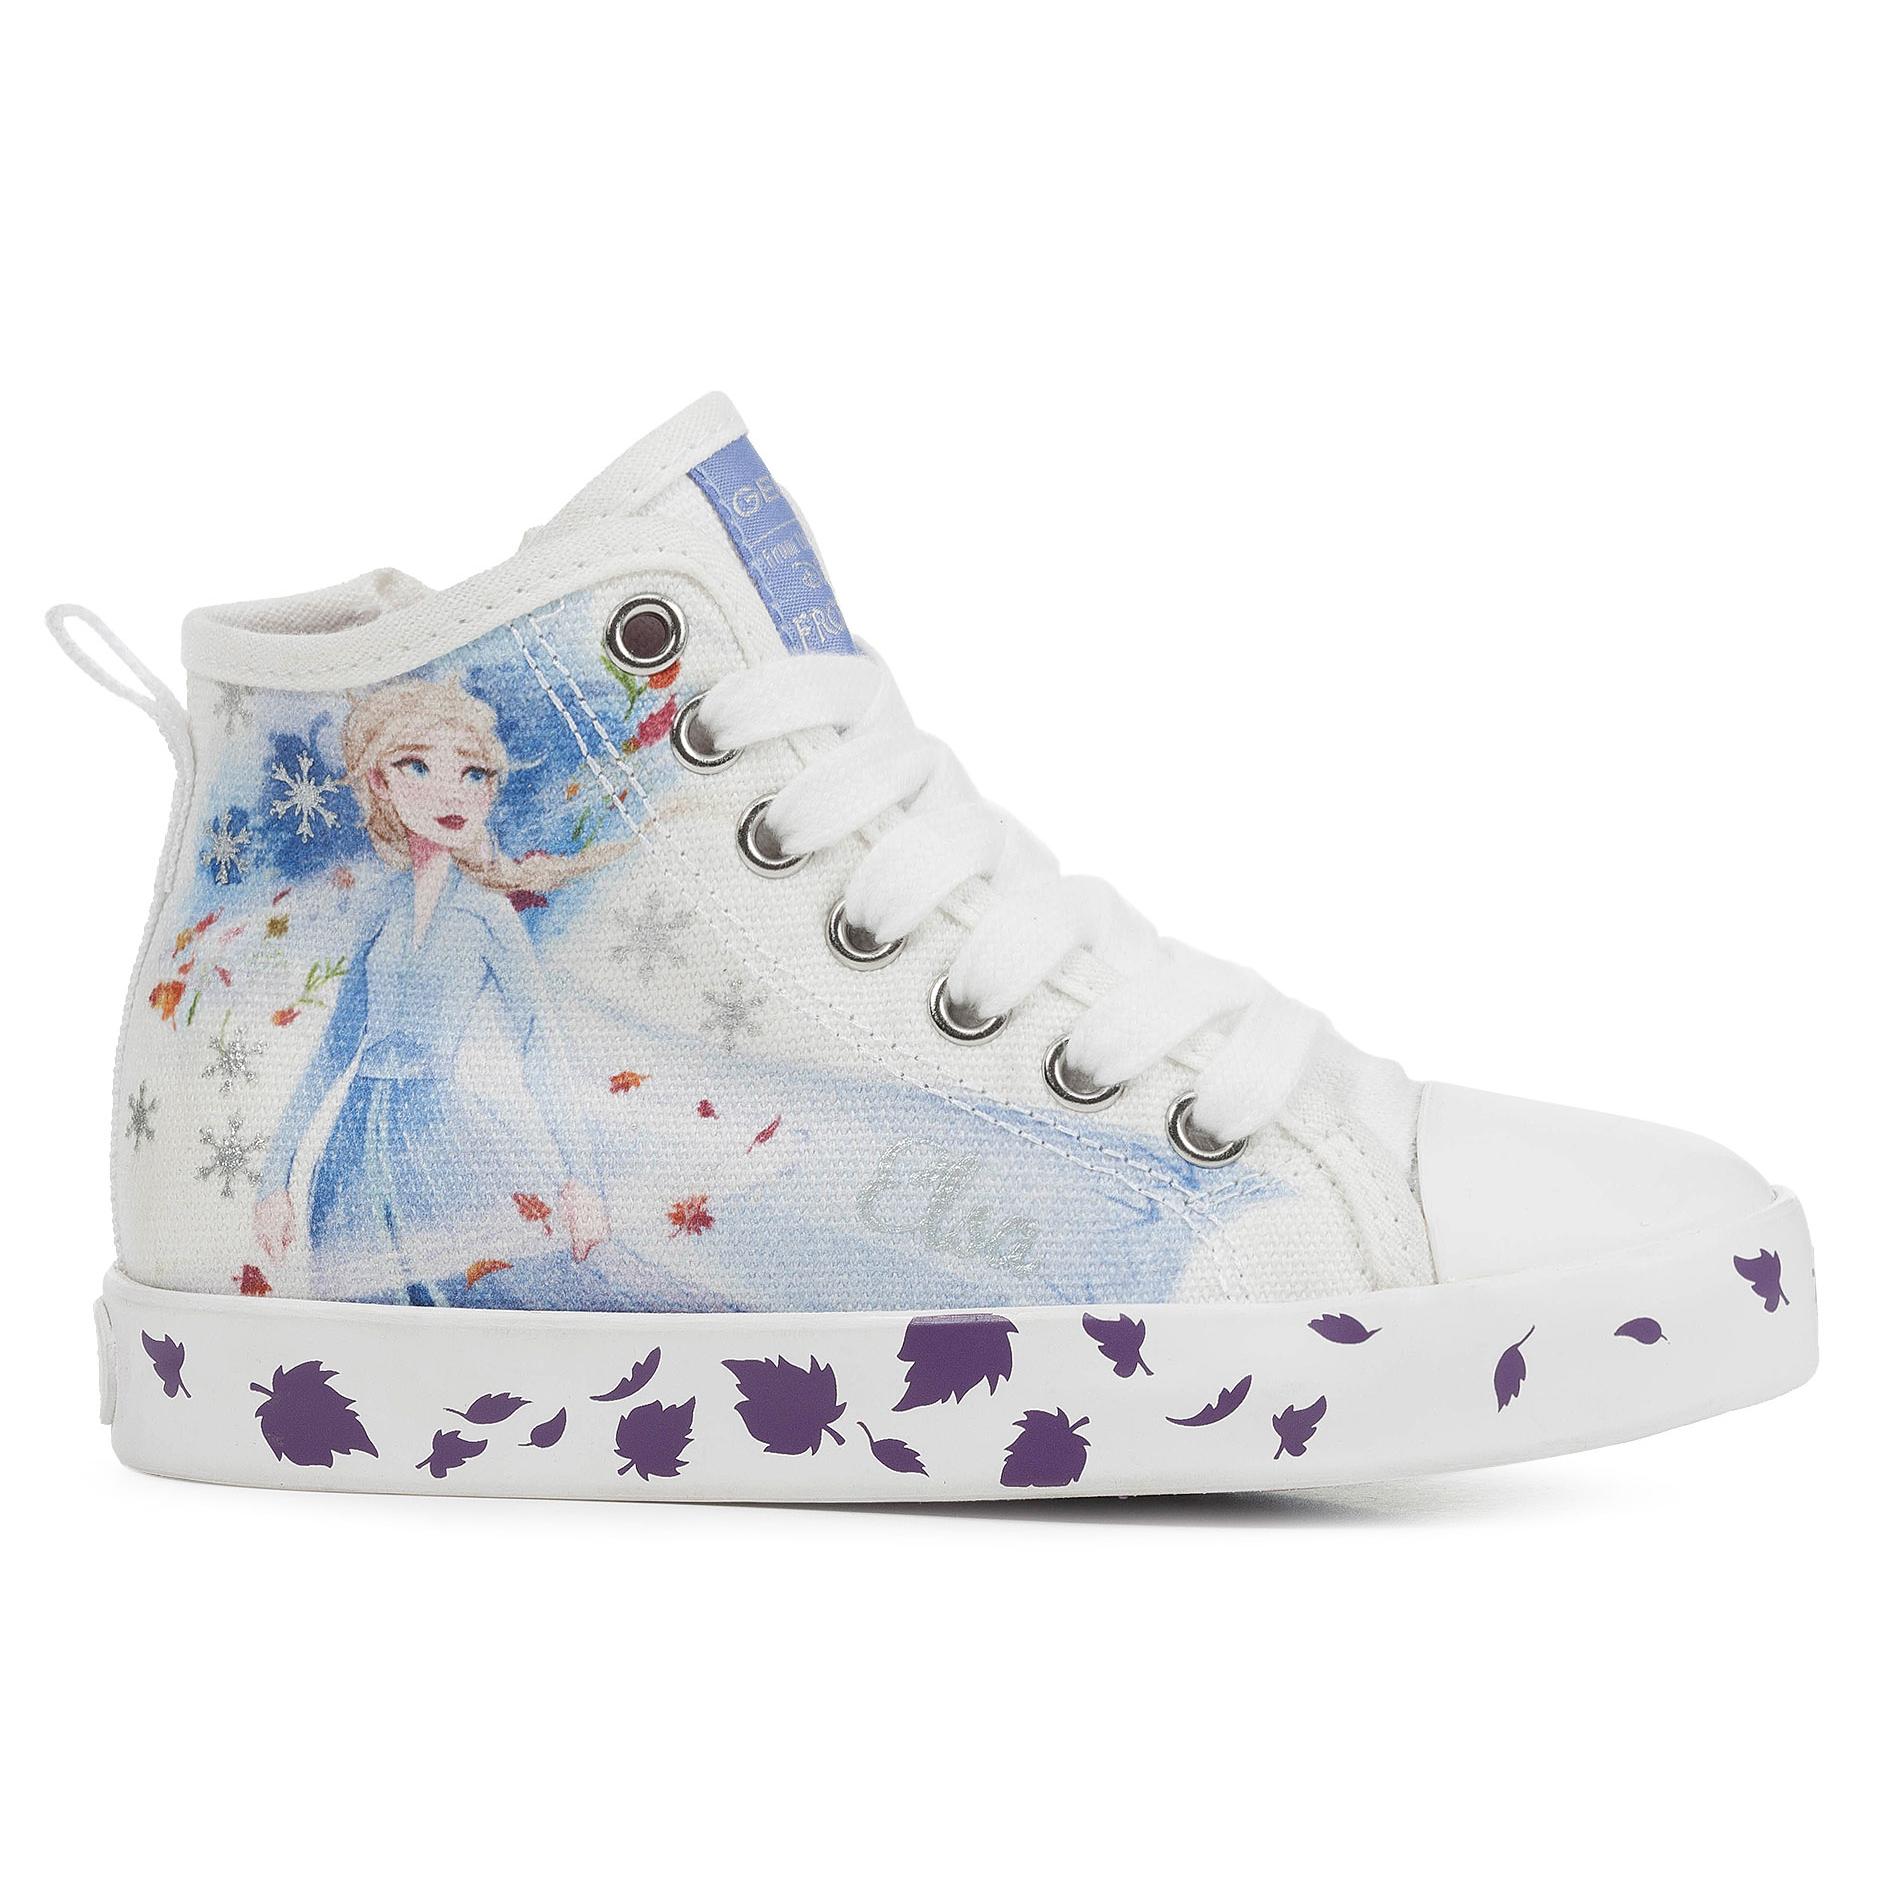 Geox Ciak Girl Frozen Shoes High-Top